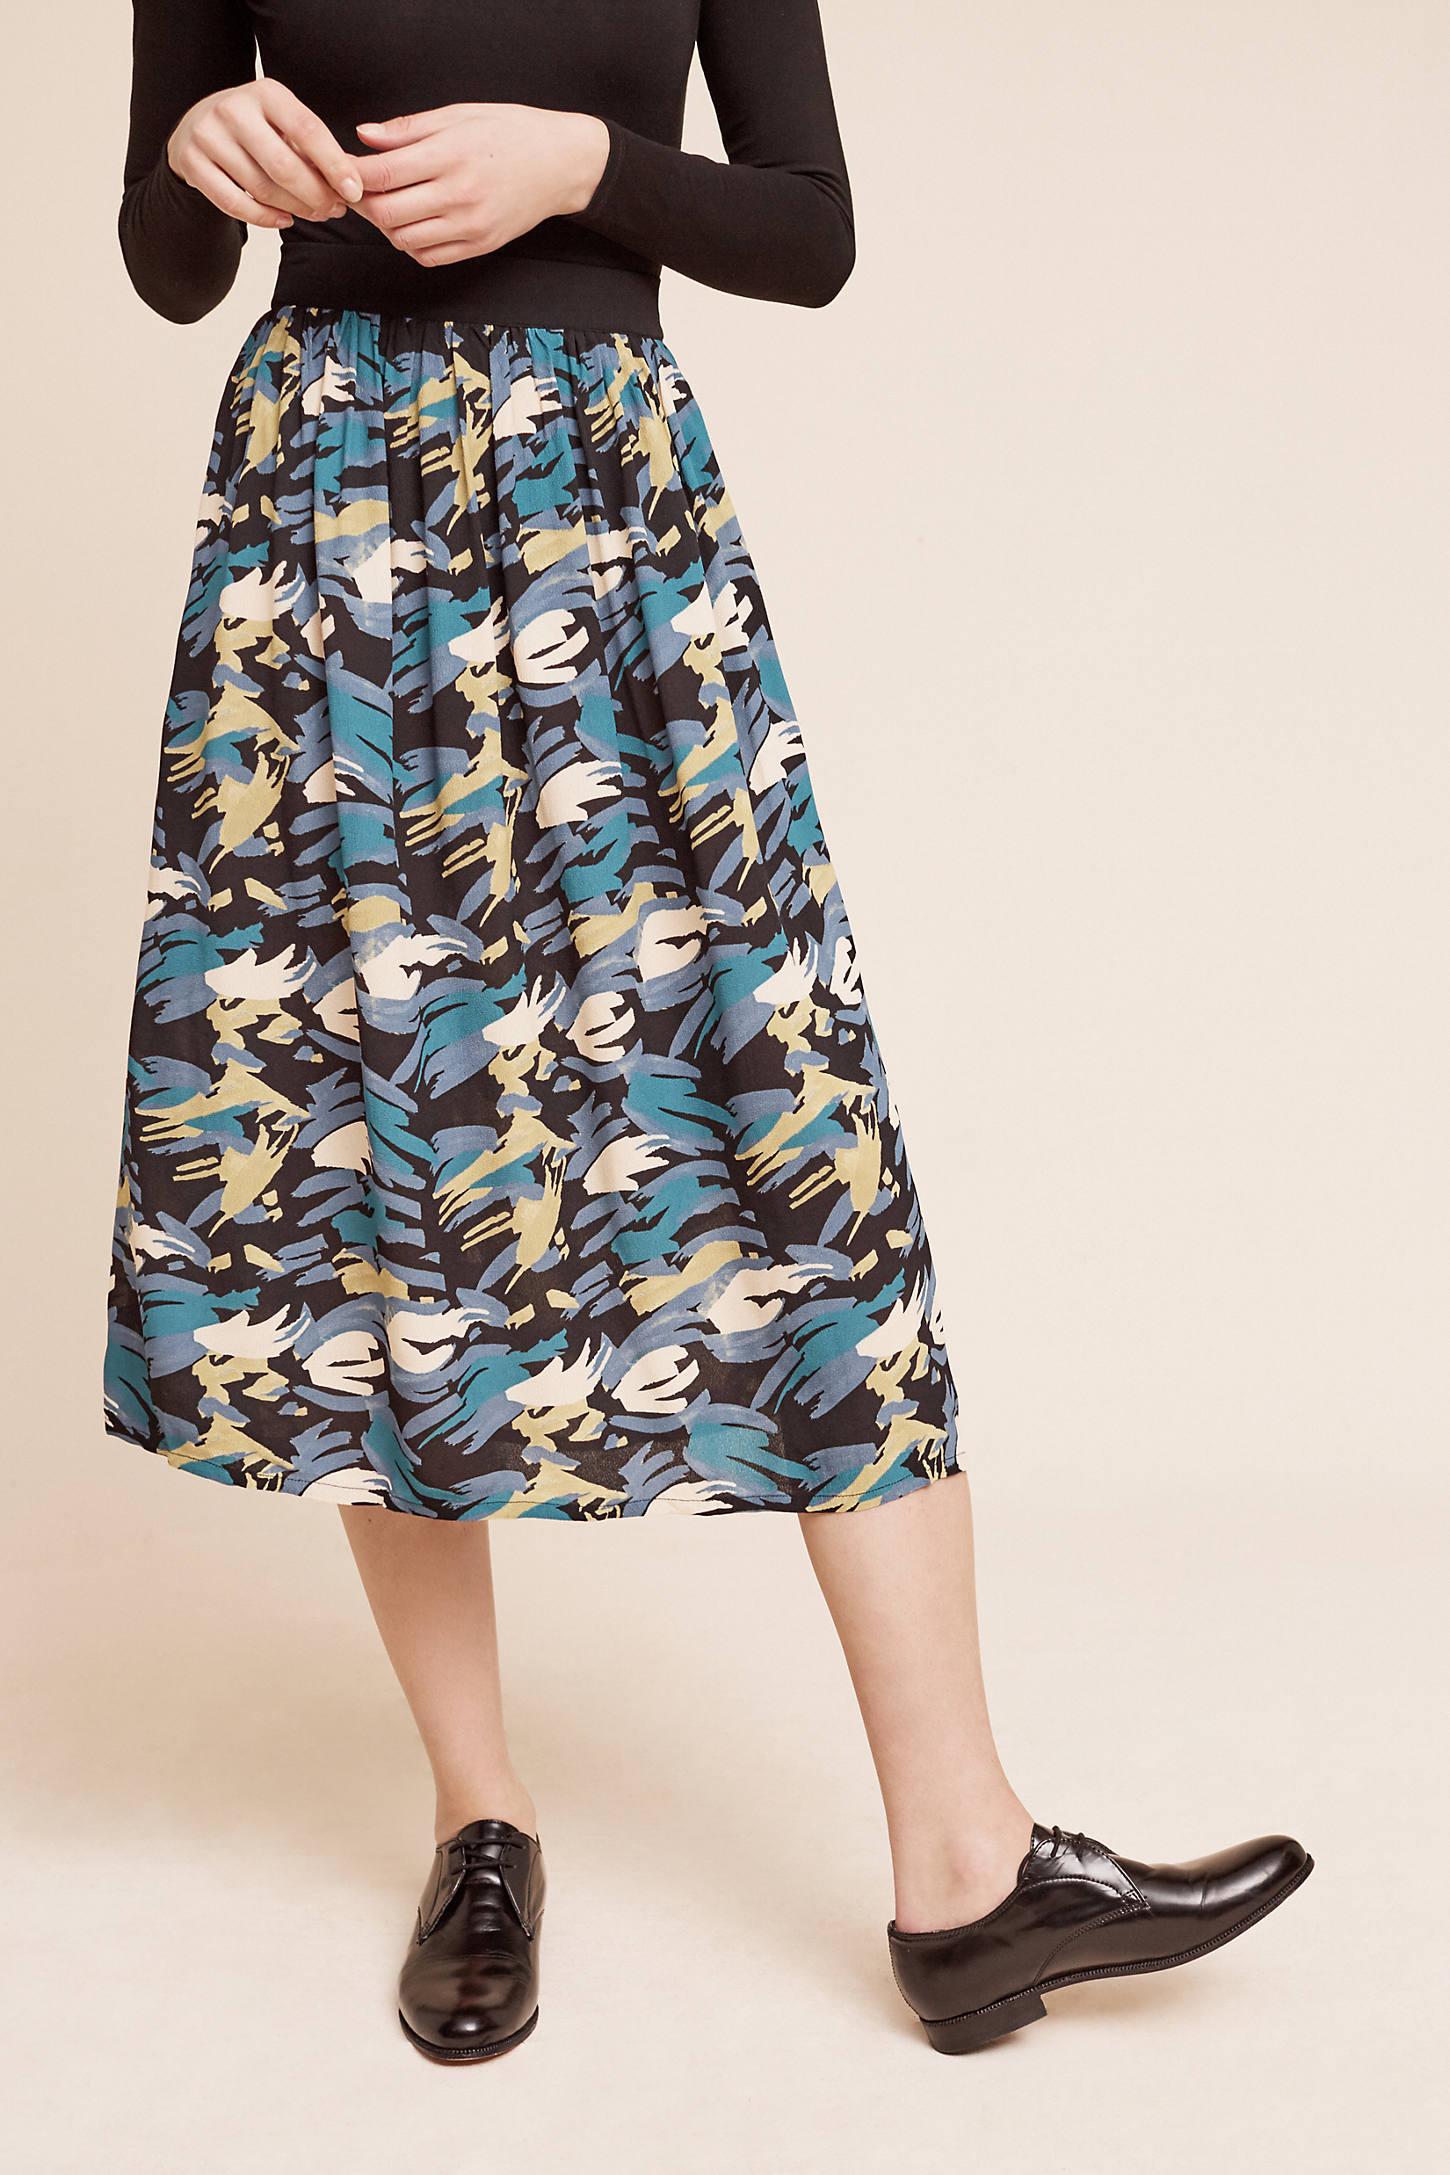 Virtuoso Midi Skirt